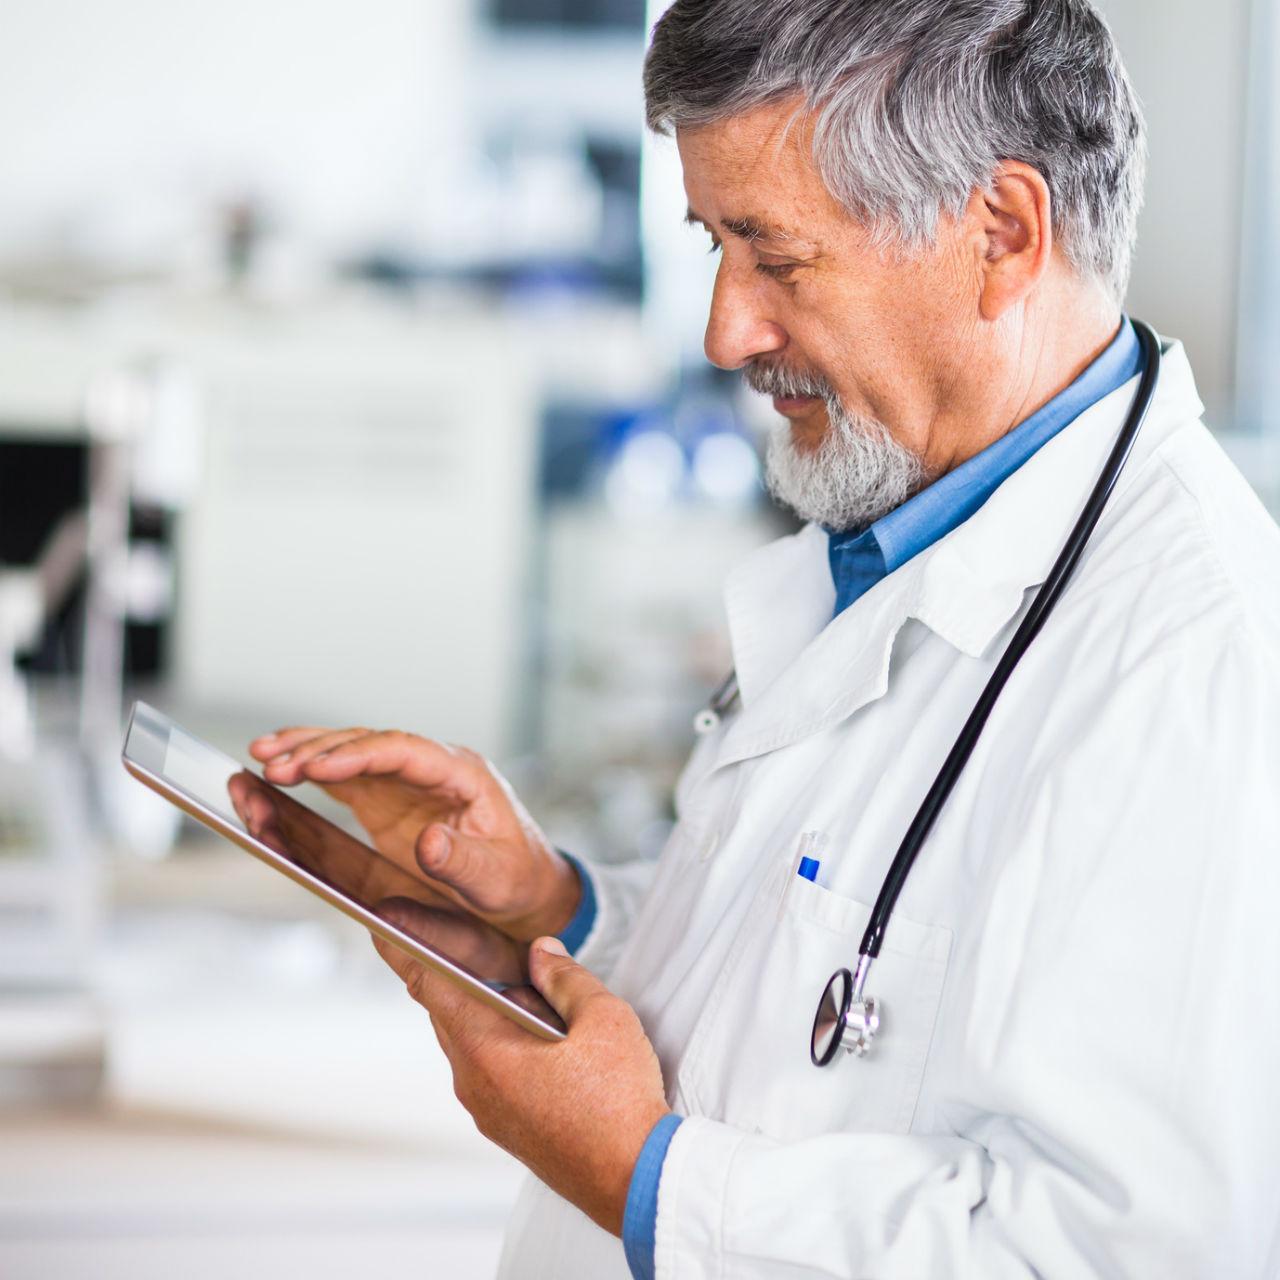 Científicos desarrollan test universal para detectar cáncer en 10 minutos